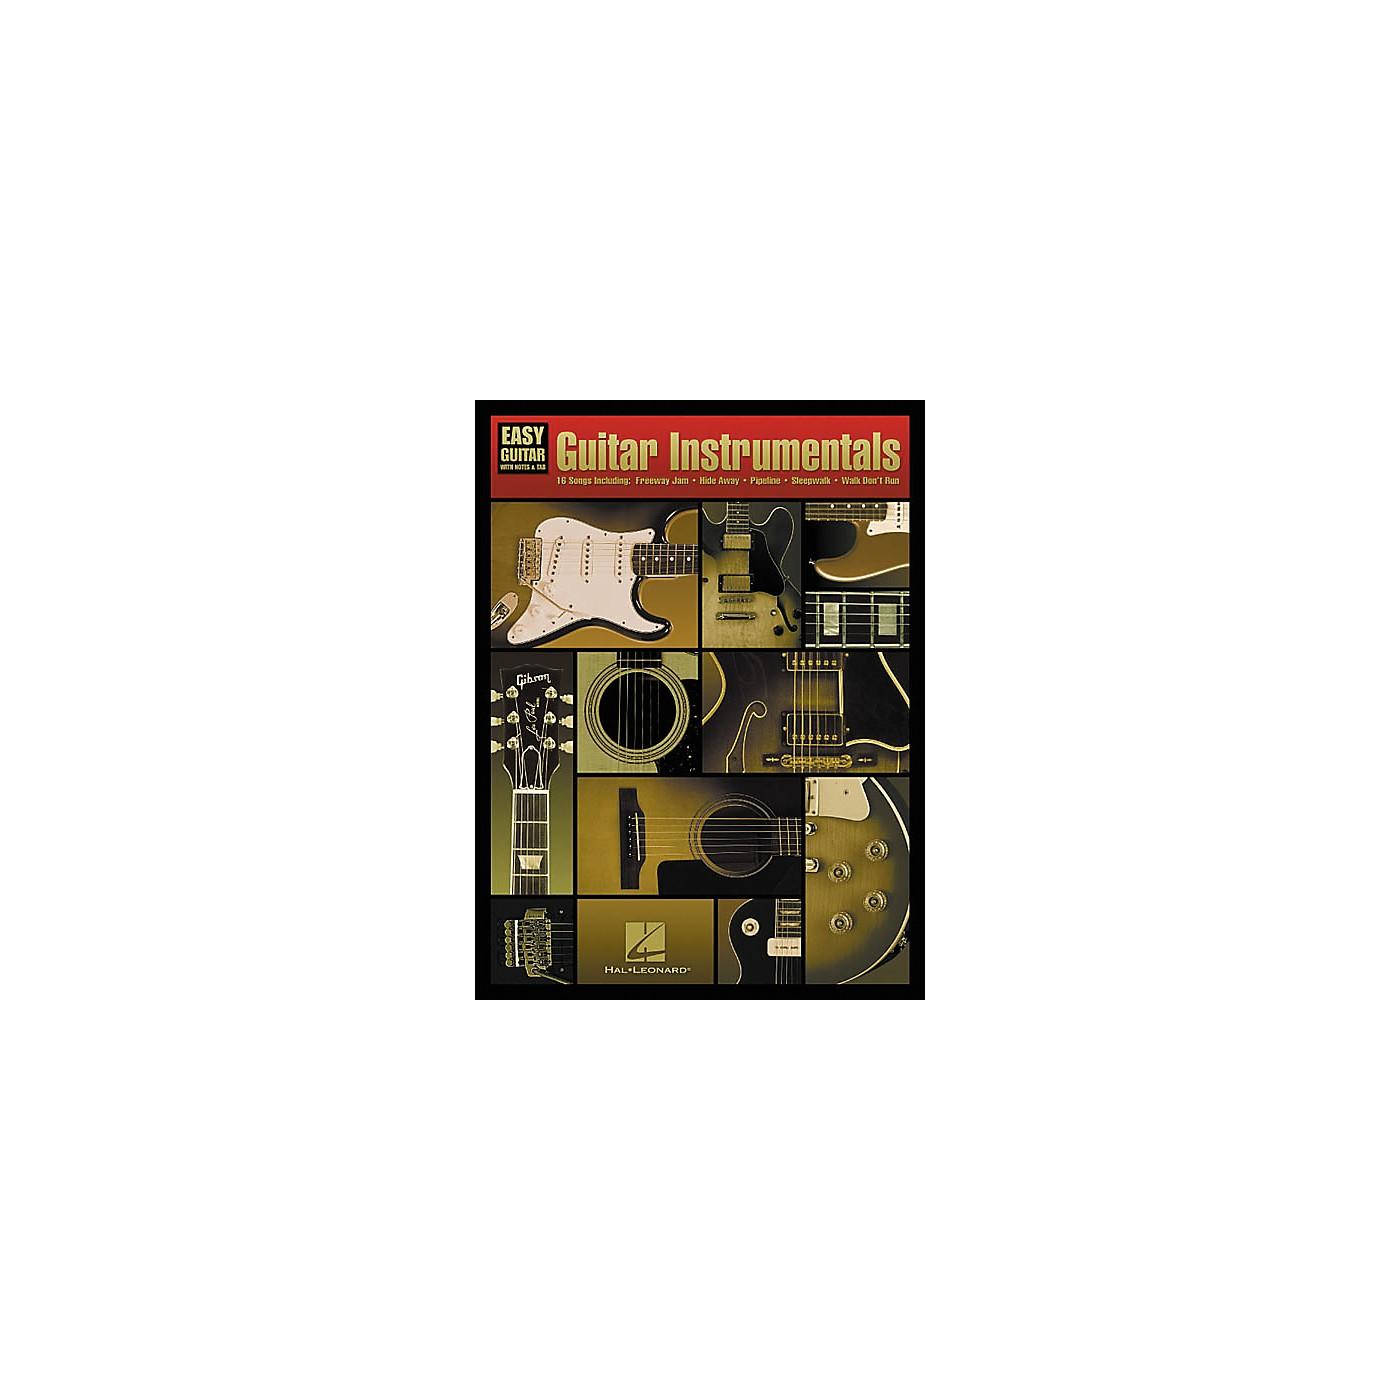 Hal Leonard Guitar Instrumentals For Easy Guitar Book thumbnail